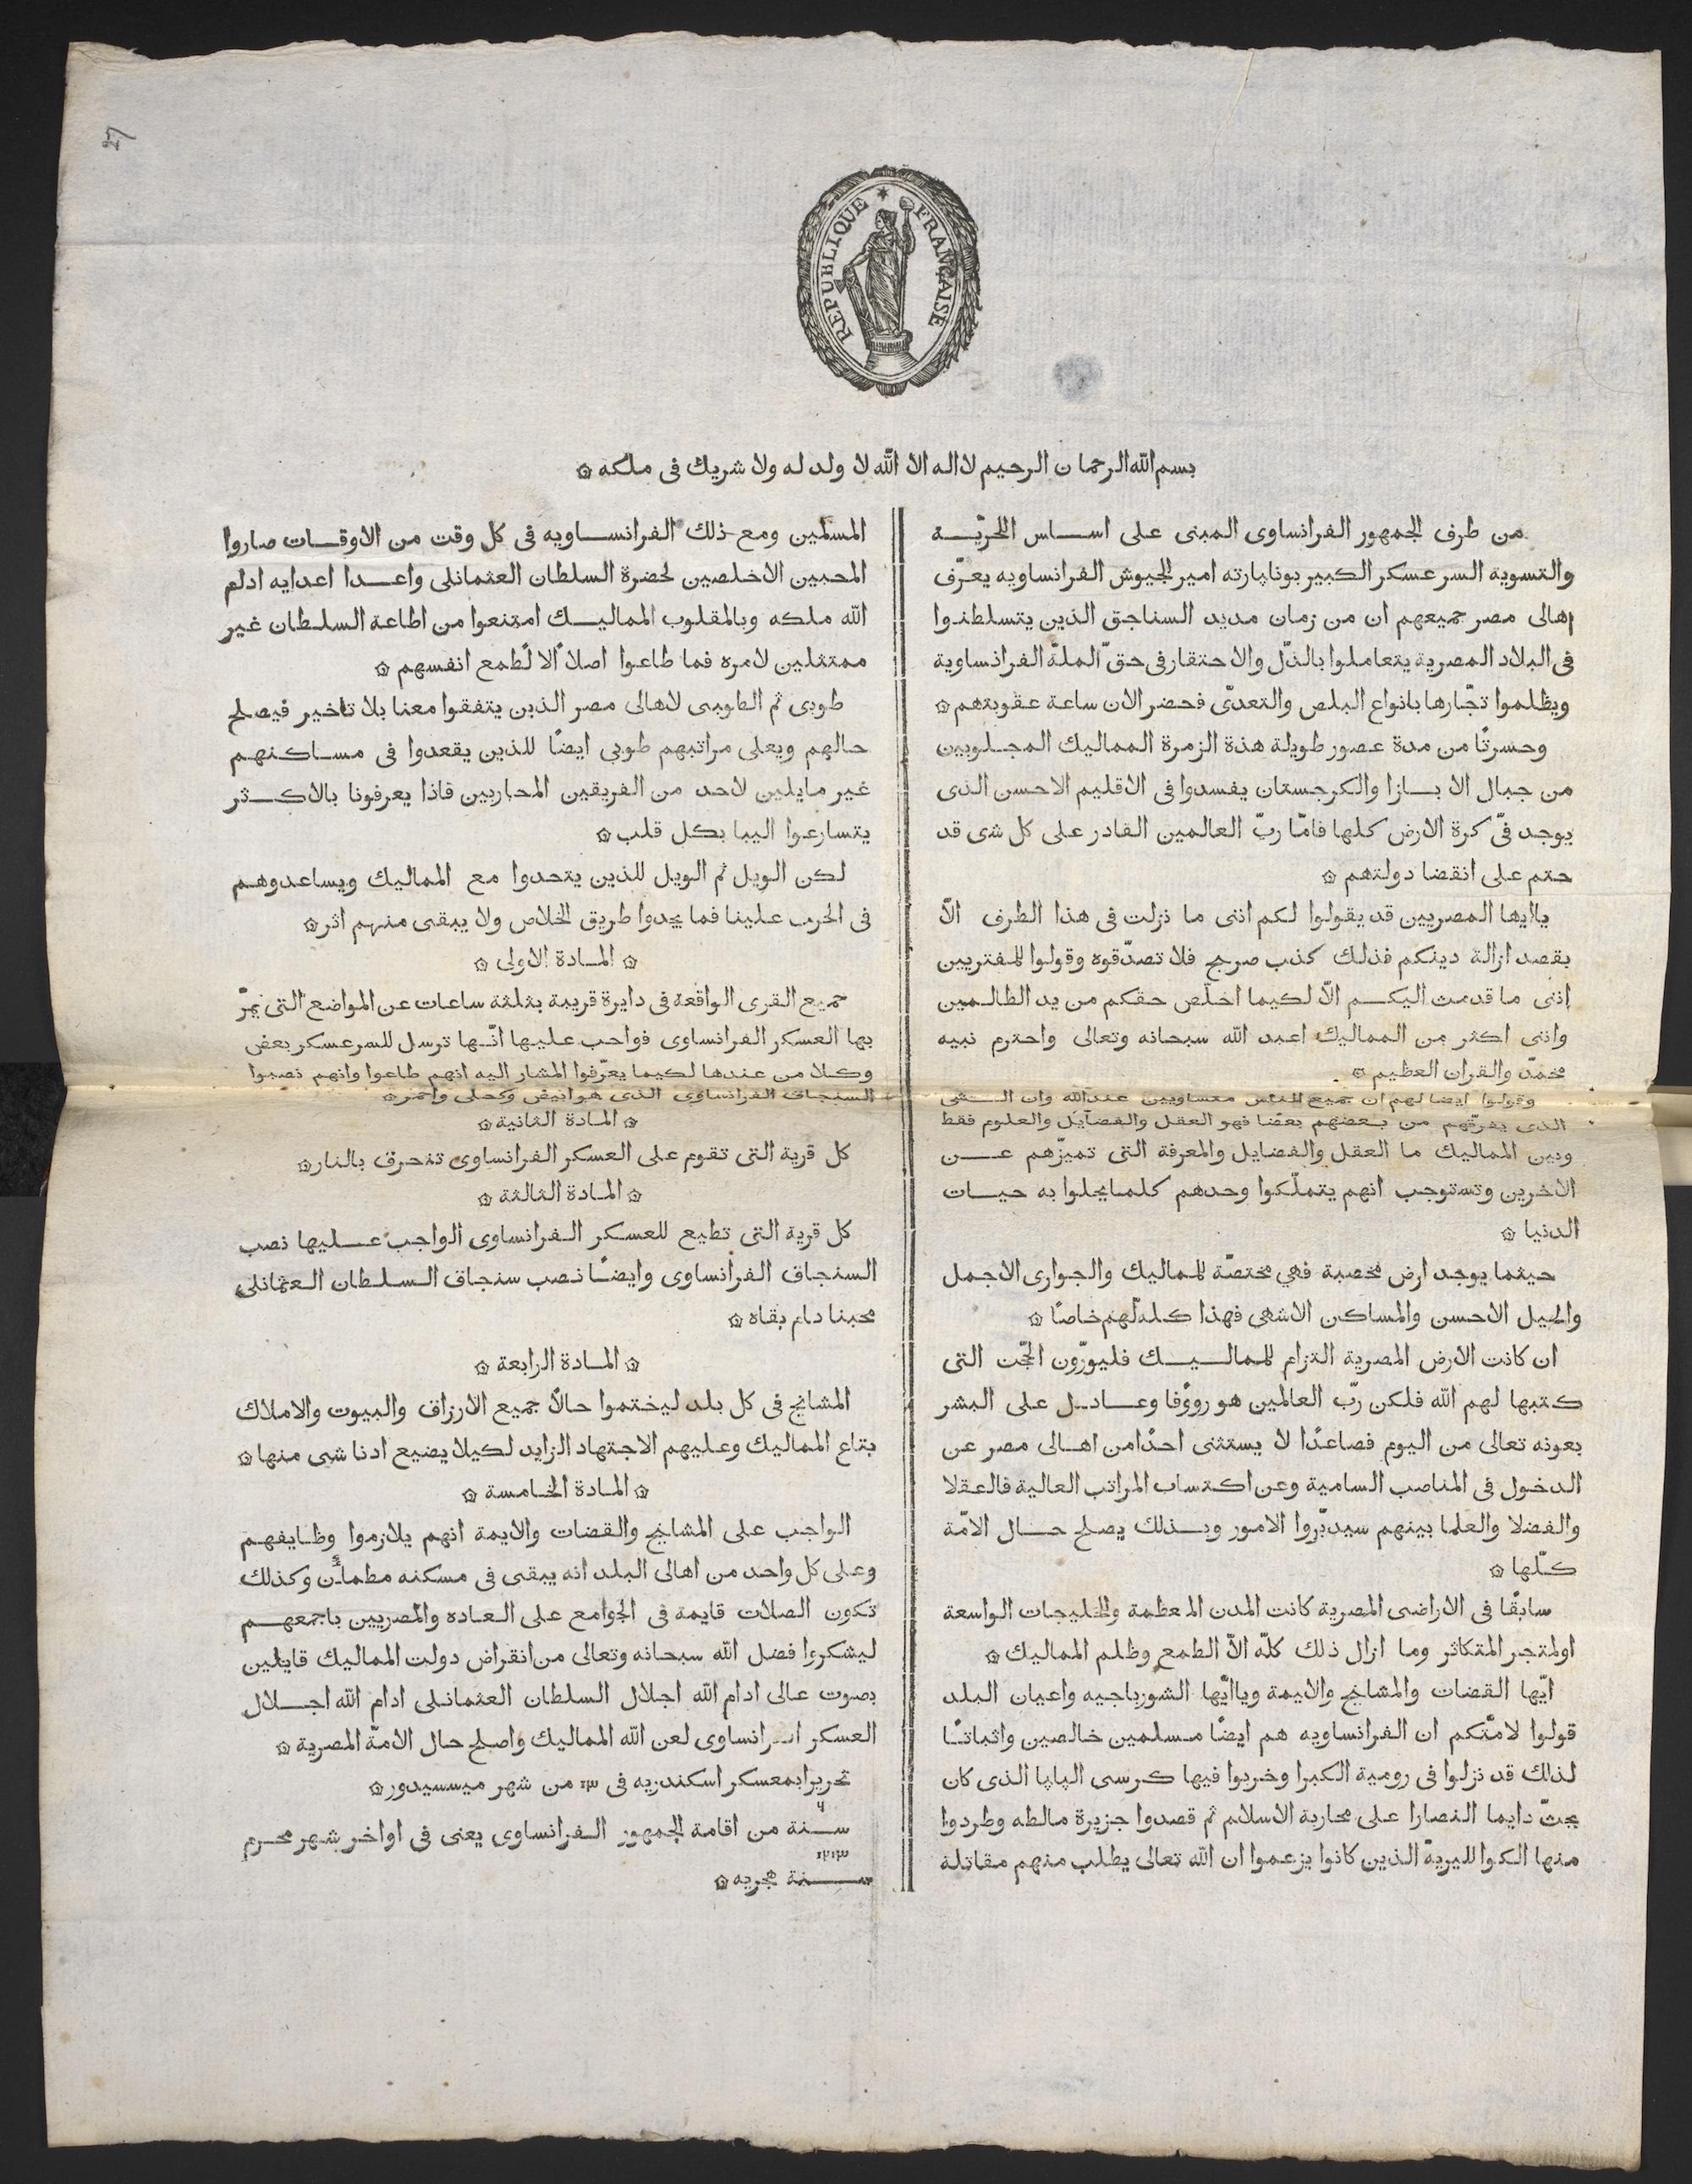 Arabic Proclamation Object Resized.jpg